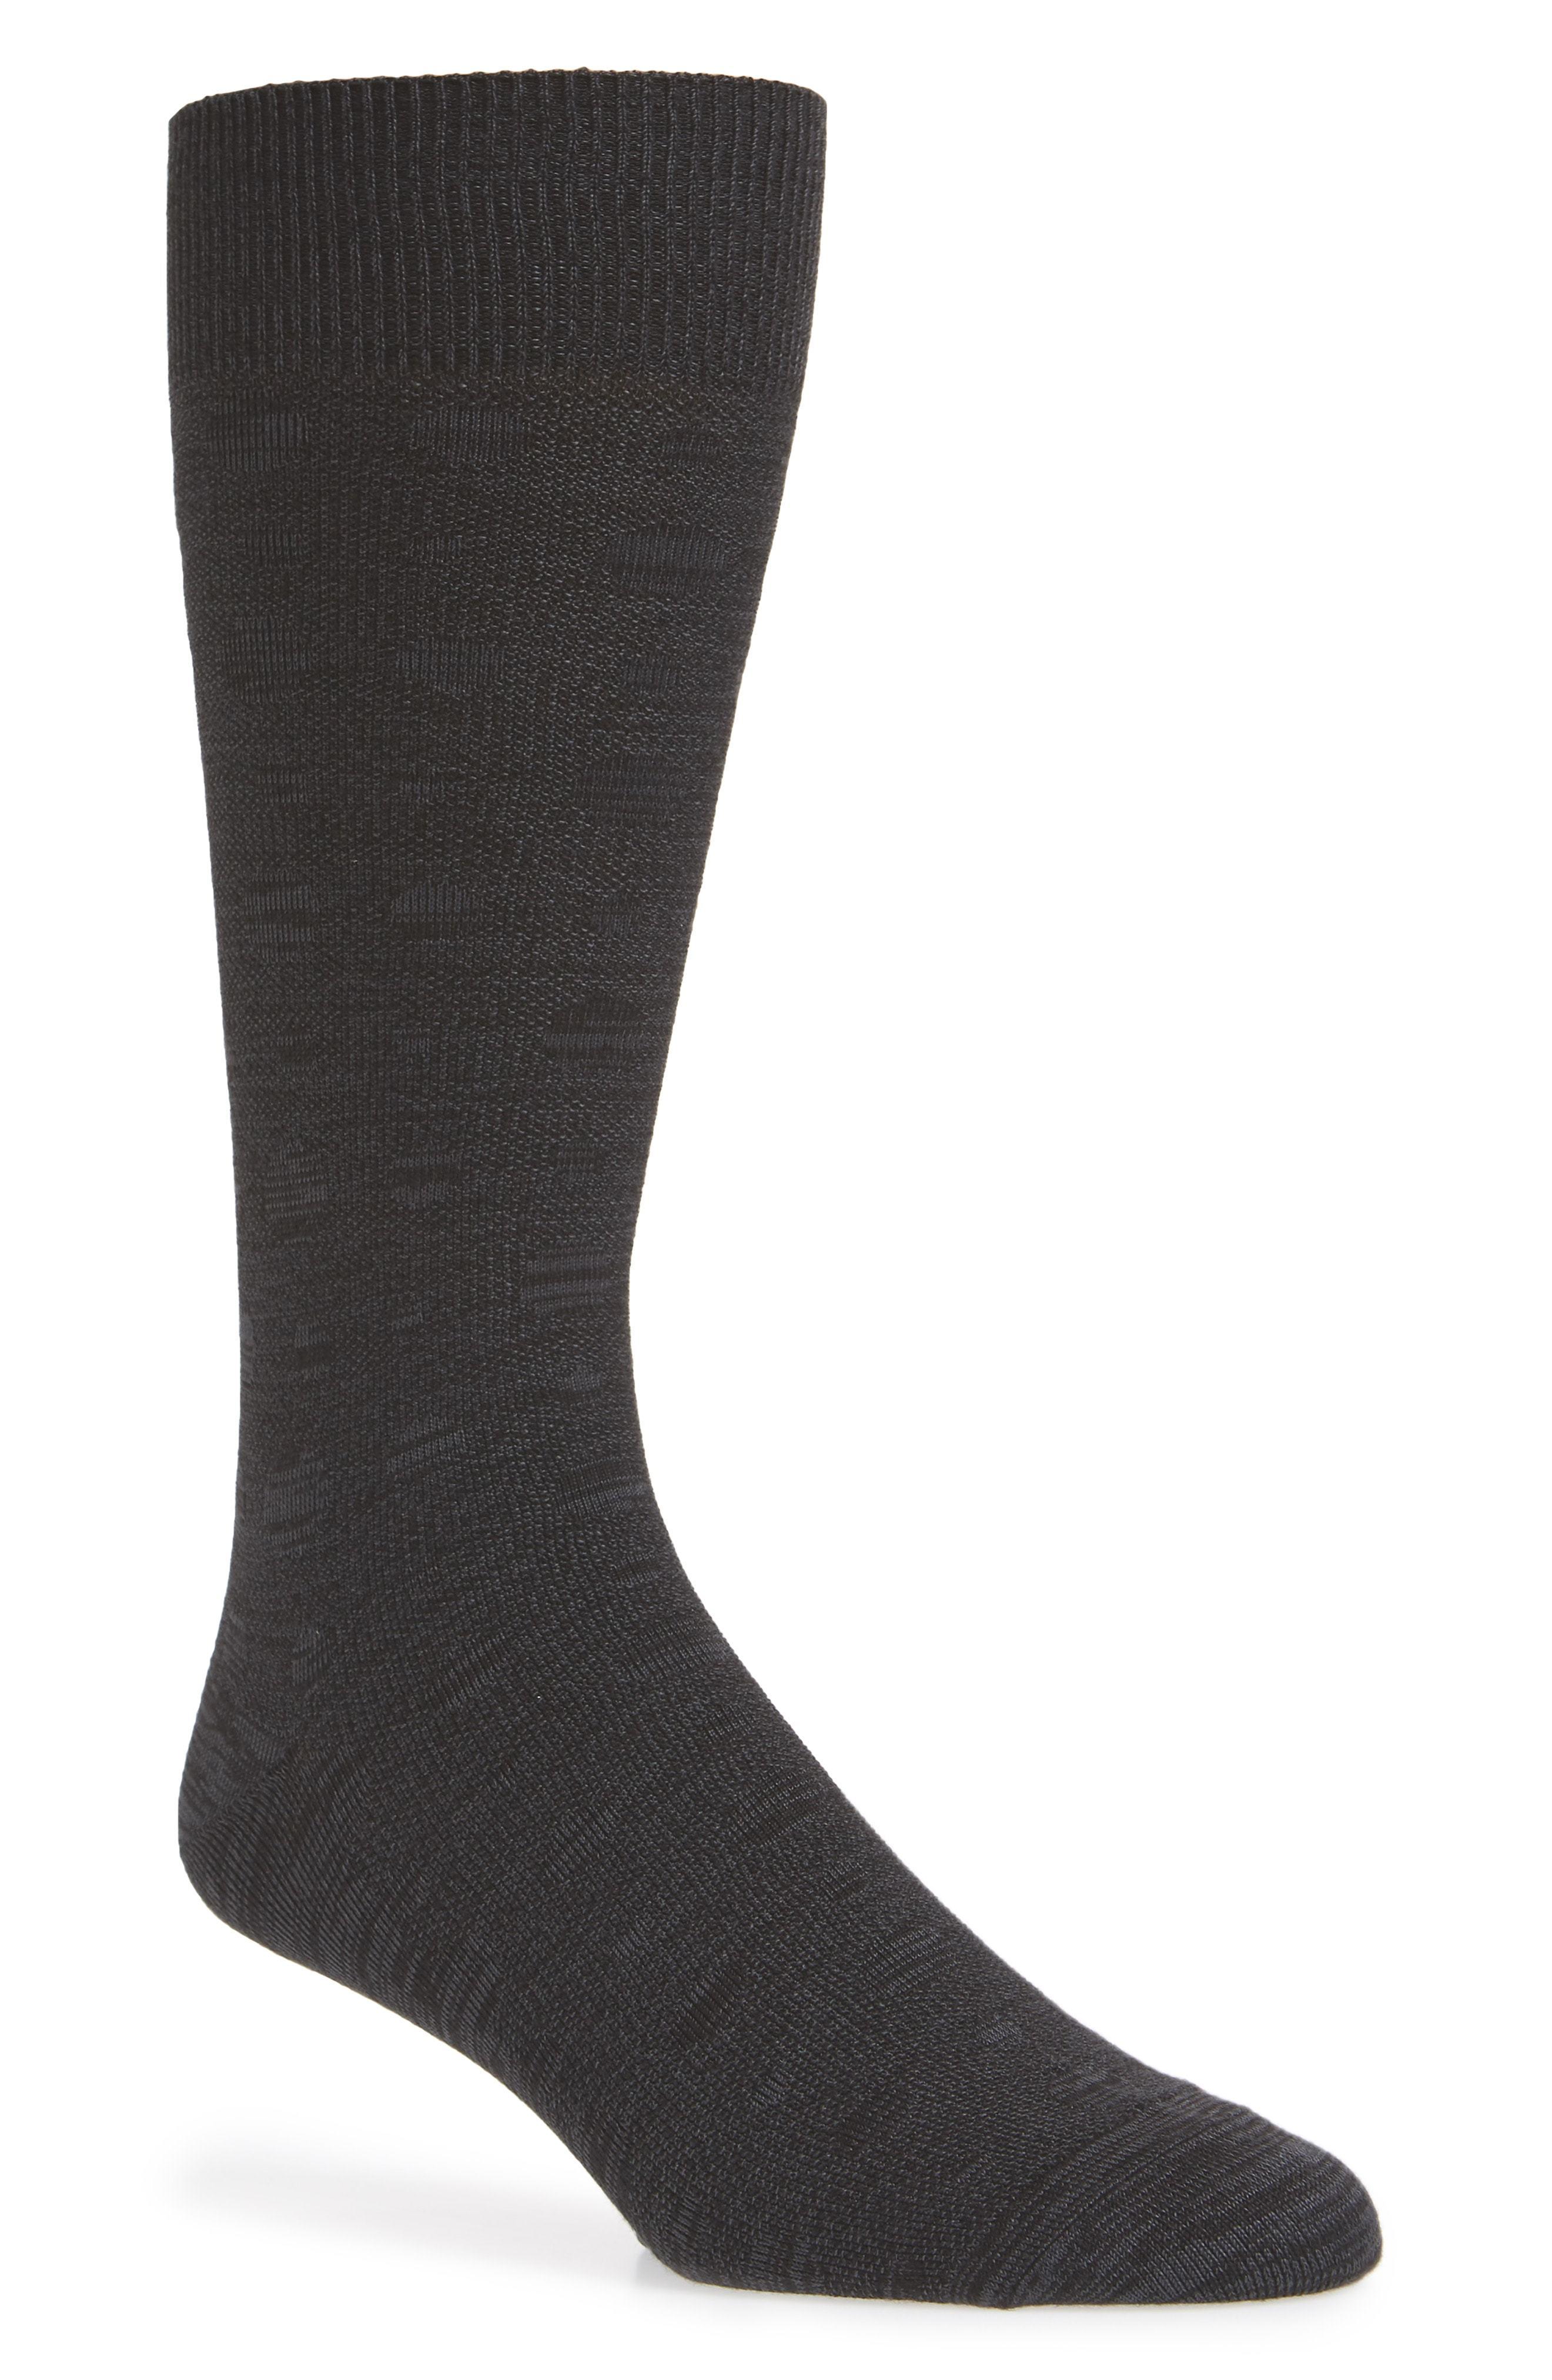 Nordstrom Men's Shop Dot Socks